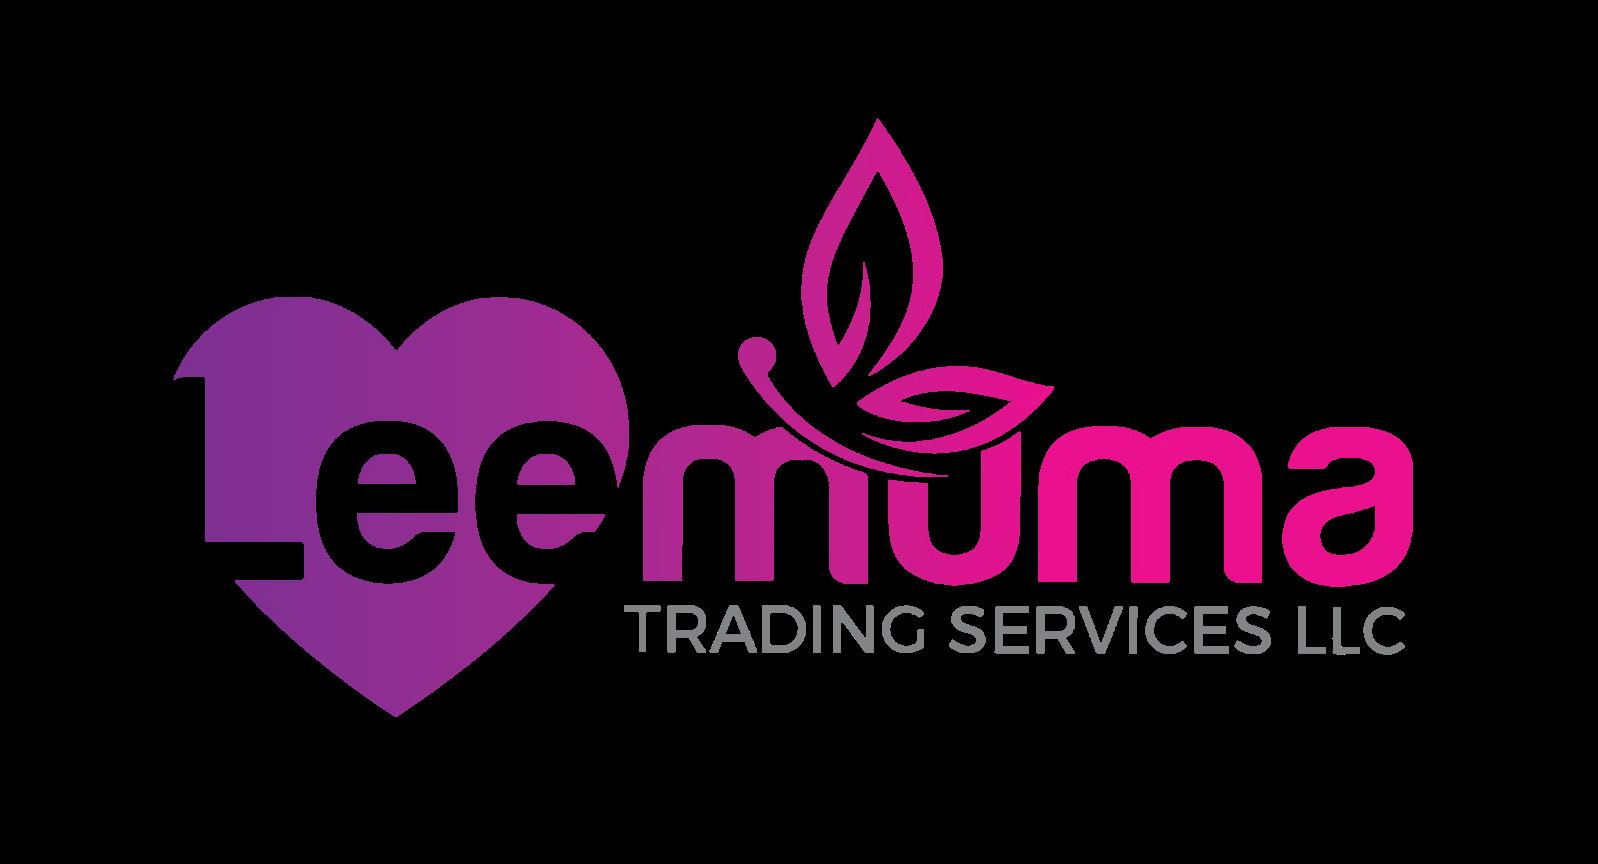 Leemuma Trading Services LLC